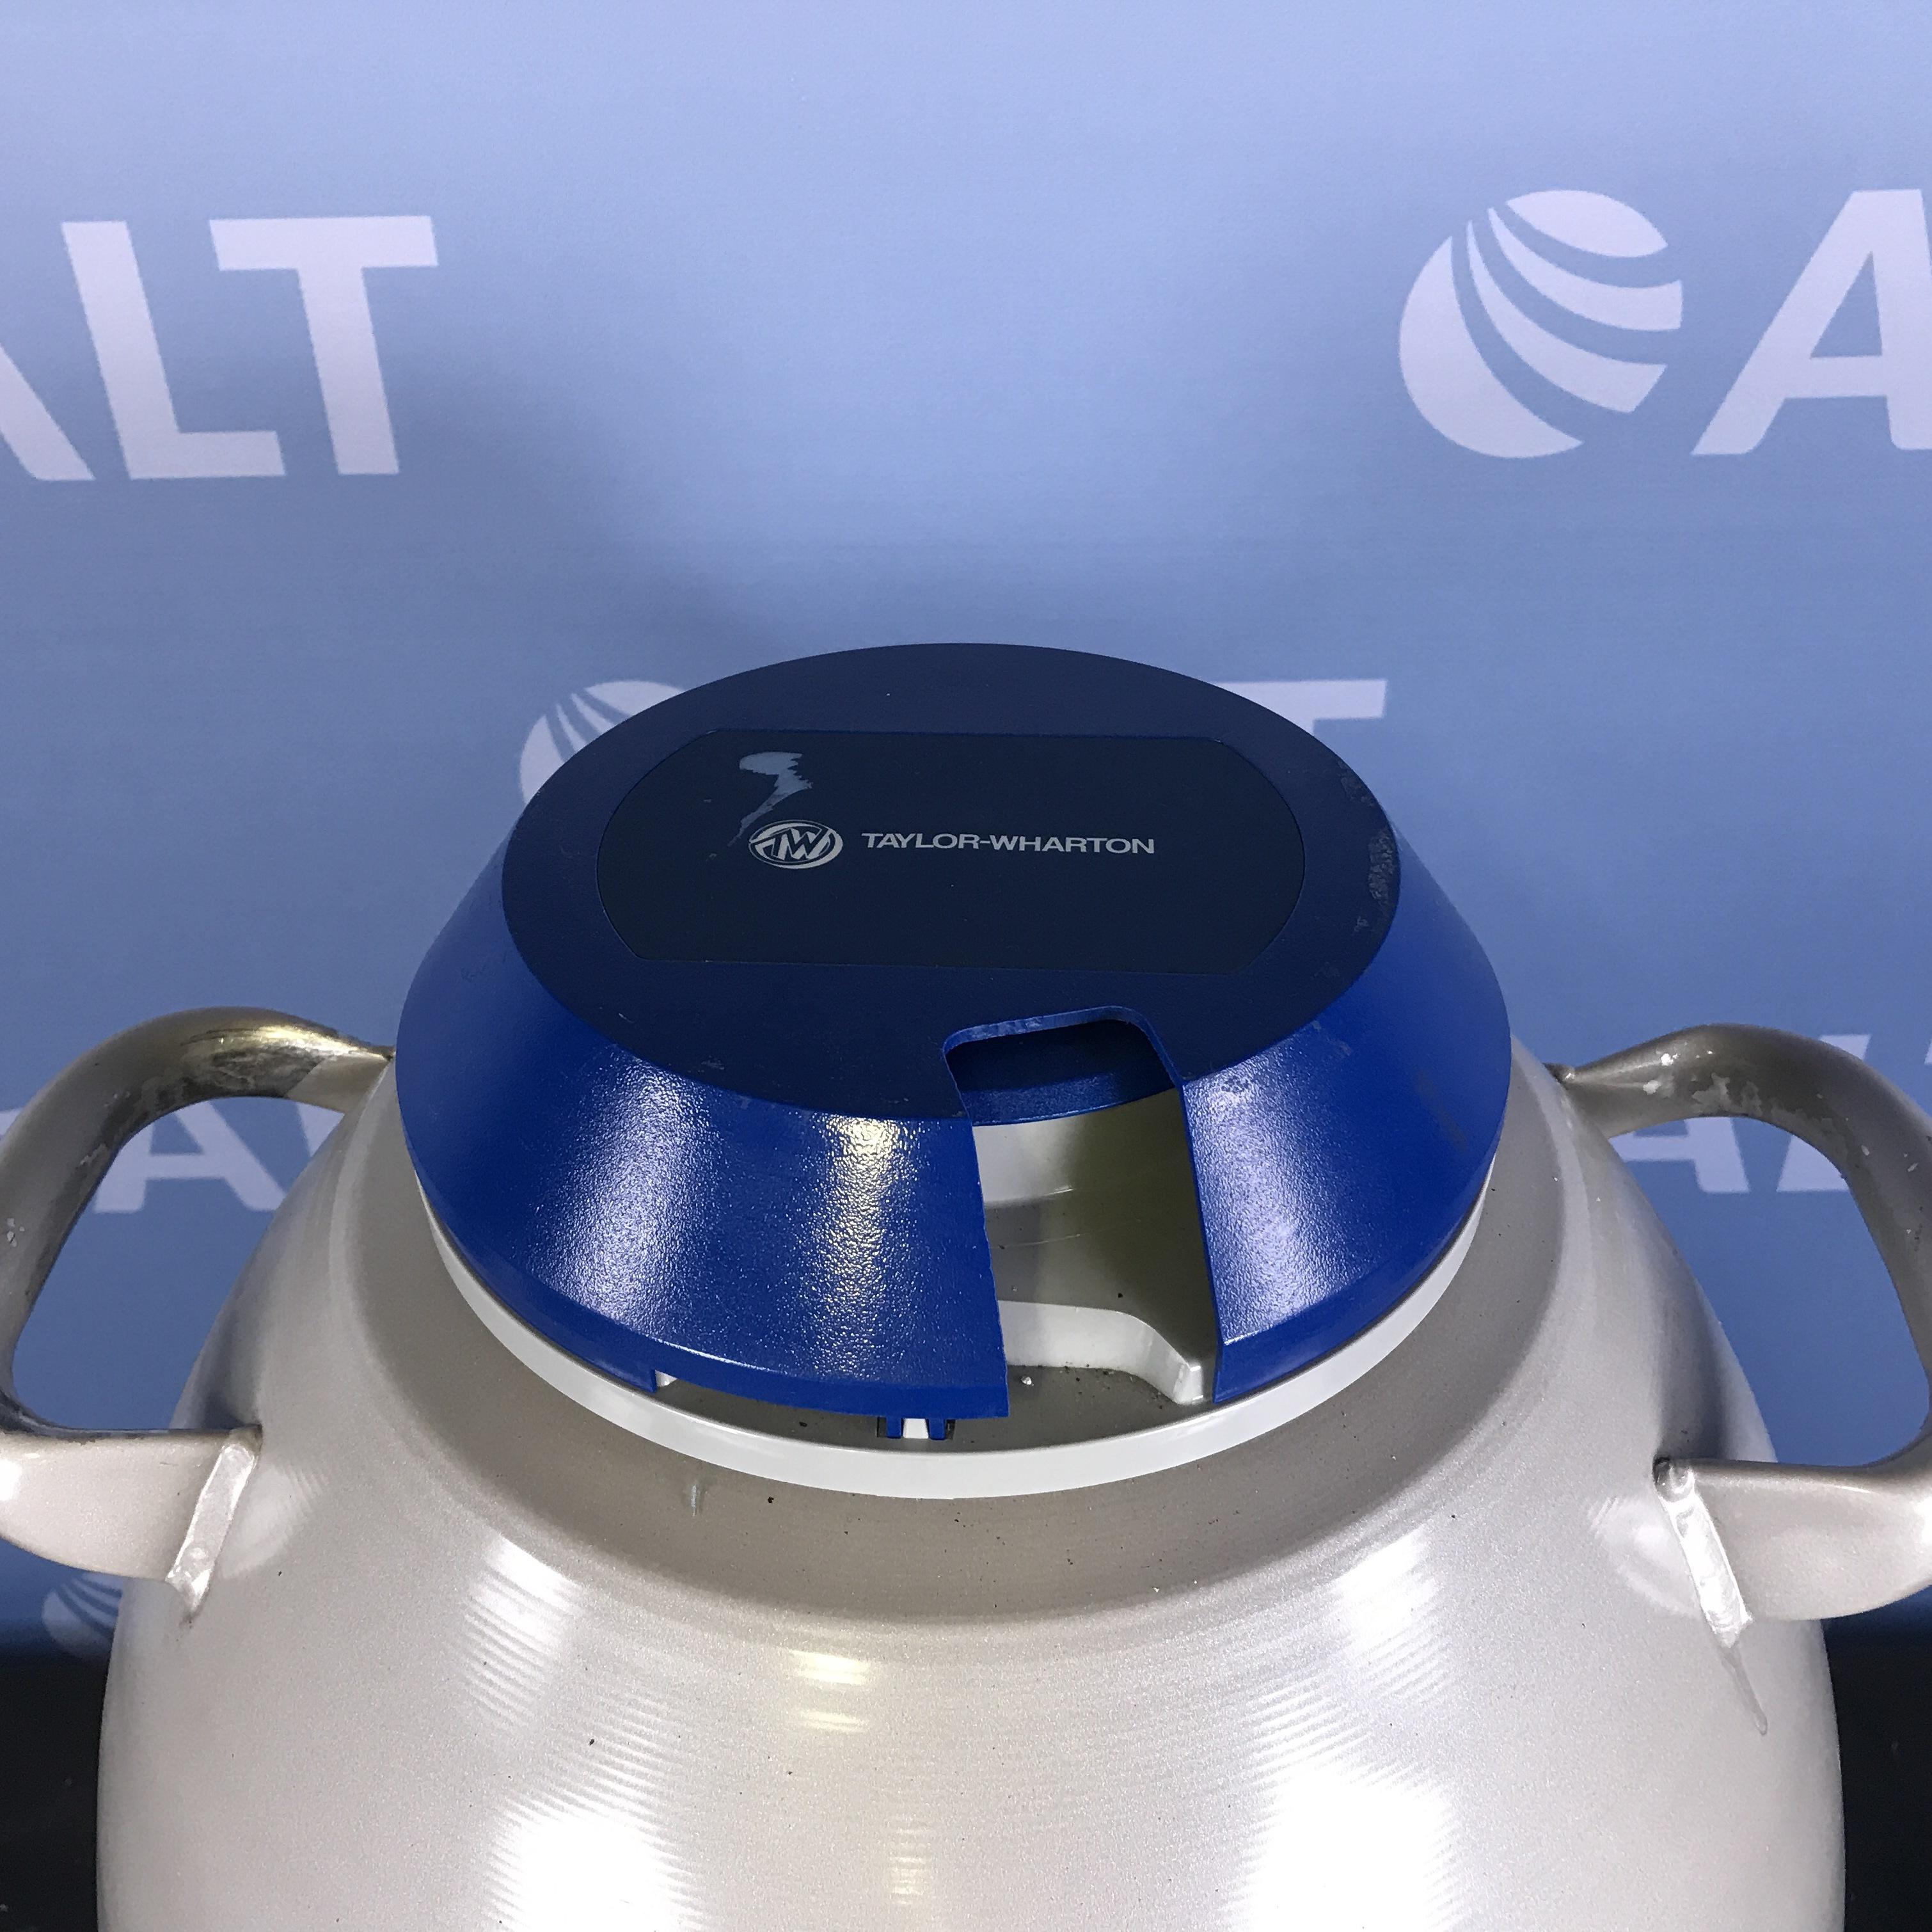 Taylor Wharton 35HC Liquid Nitrogen Storage Container Image